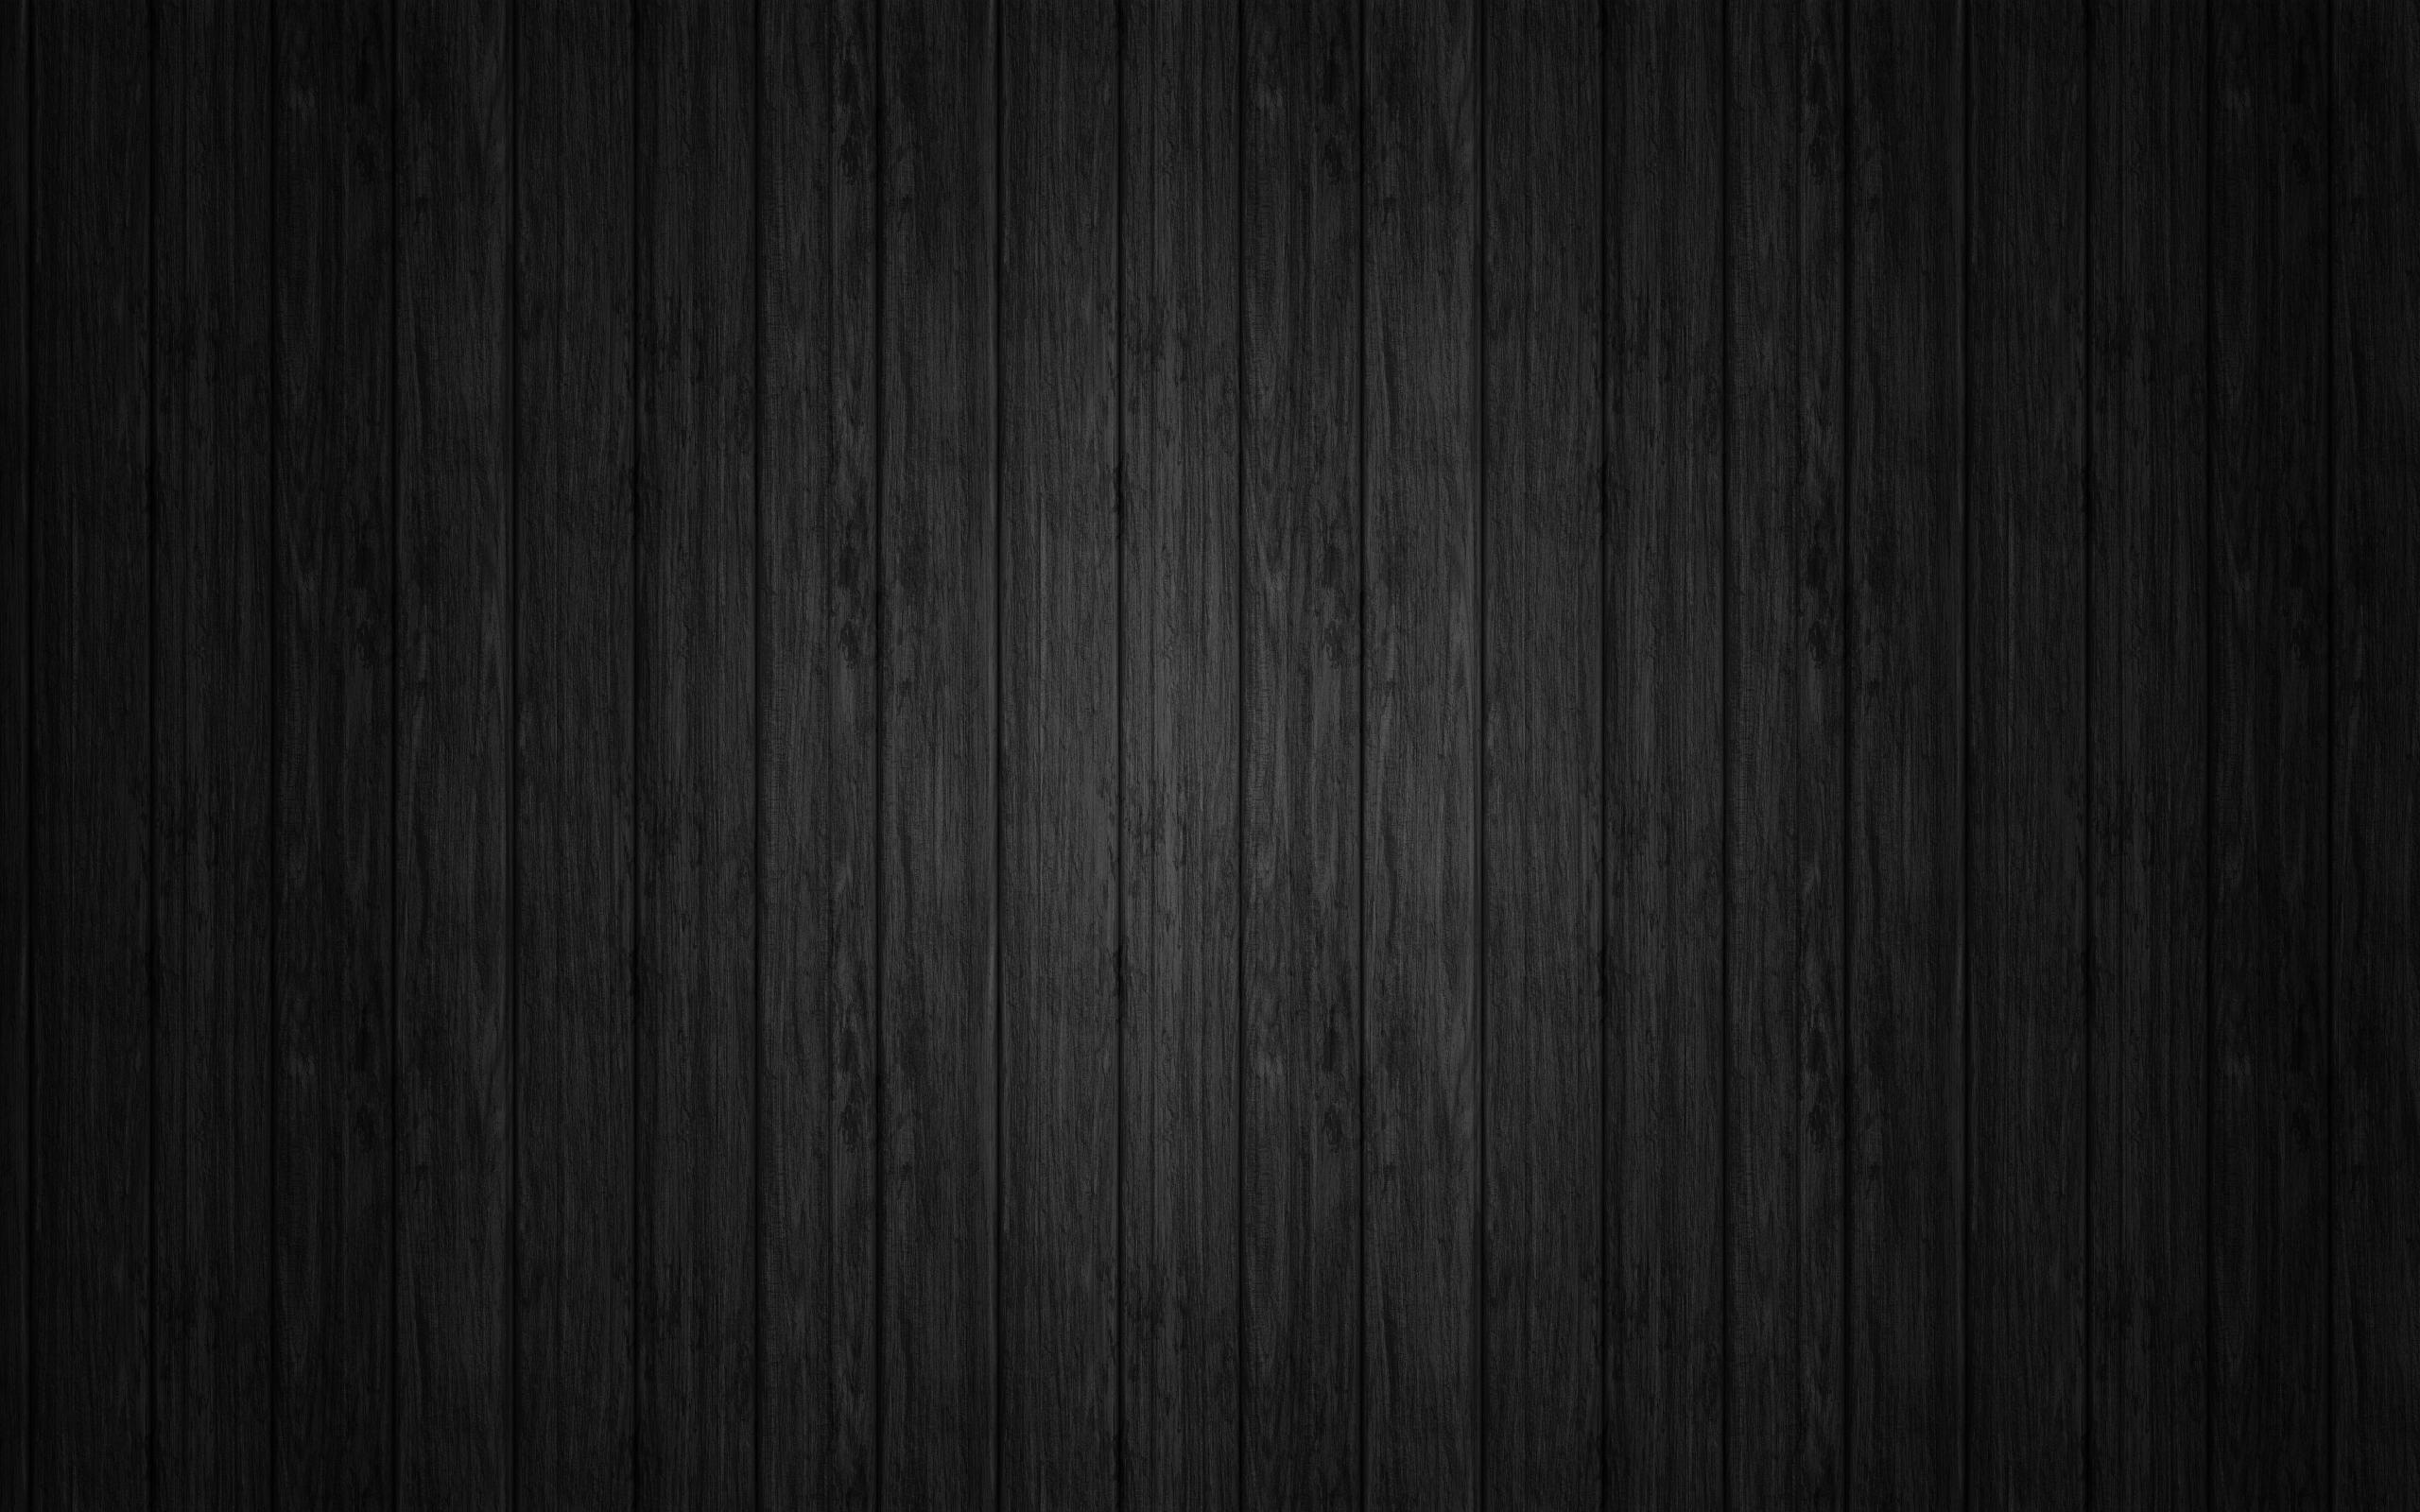 Free Download Black Background Wallpaper 2560x1600 Black Background Wood 2560x1600 For Your Desktop Mobile Tablet Explore 48 Black Image Wallpaper Black Pc Wallpaper Black Hd Wallpaper Cool Black Wallpaper Images